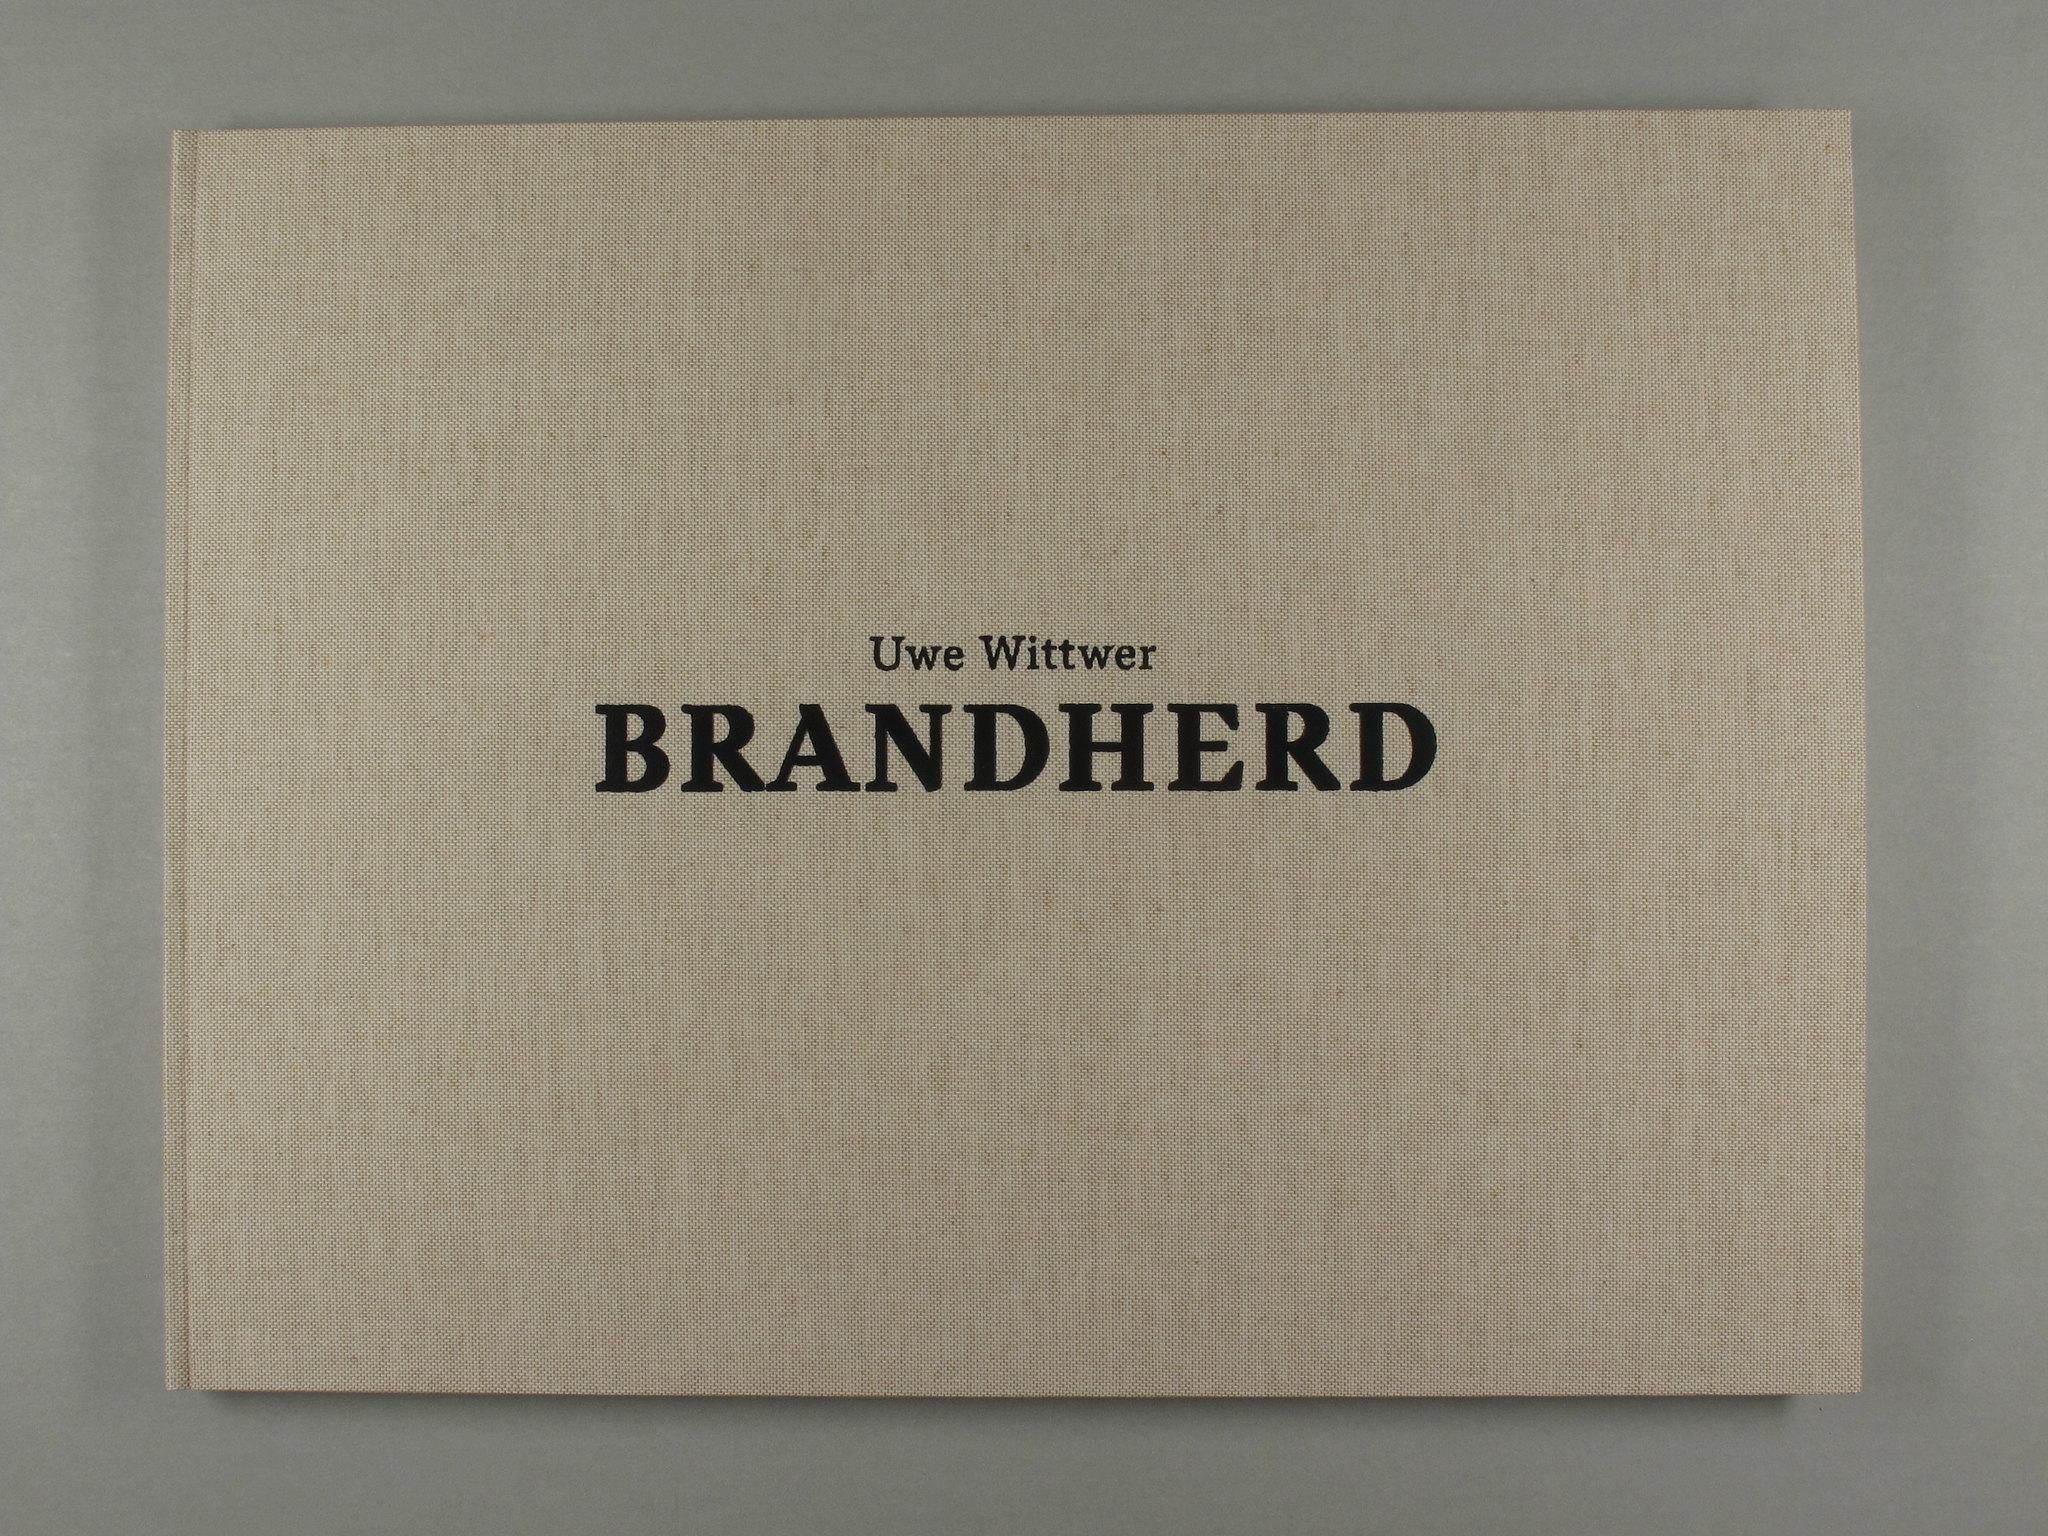 Brandherd_Uwe_Wittwer_5191